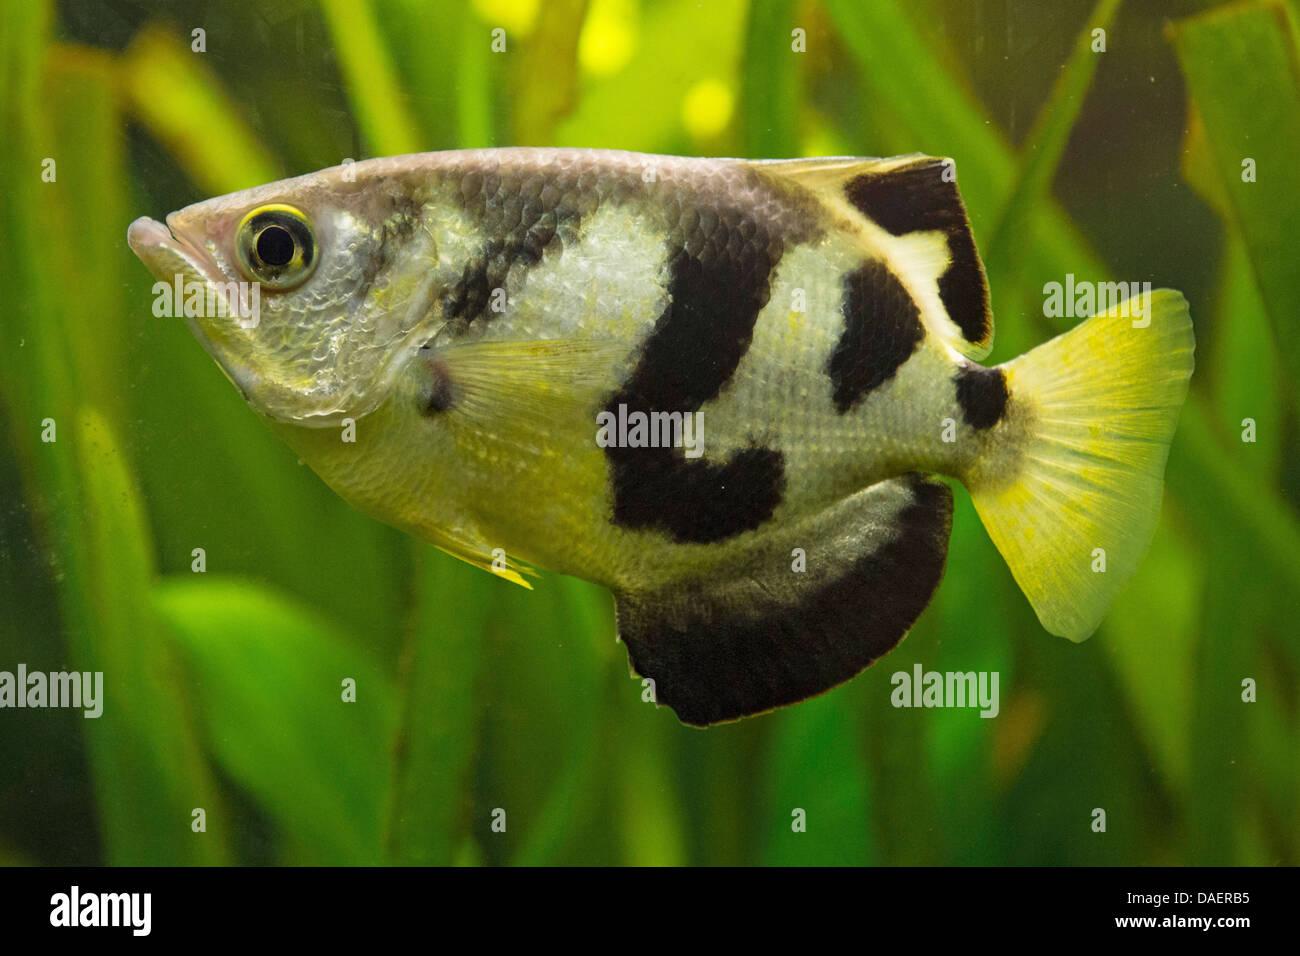 Archerfish (Toxotidae), en agua dulce Imagen De Stock